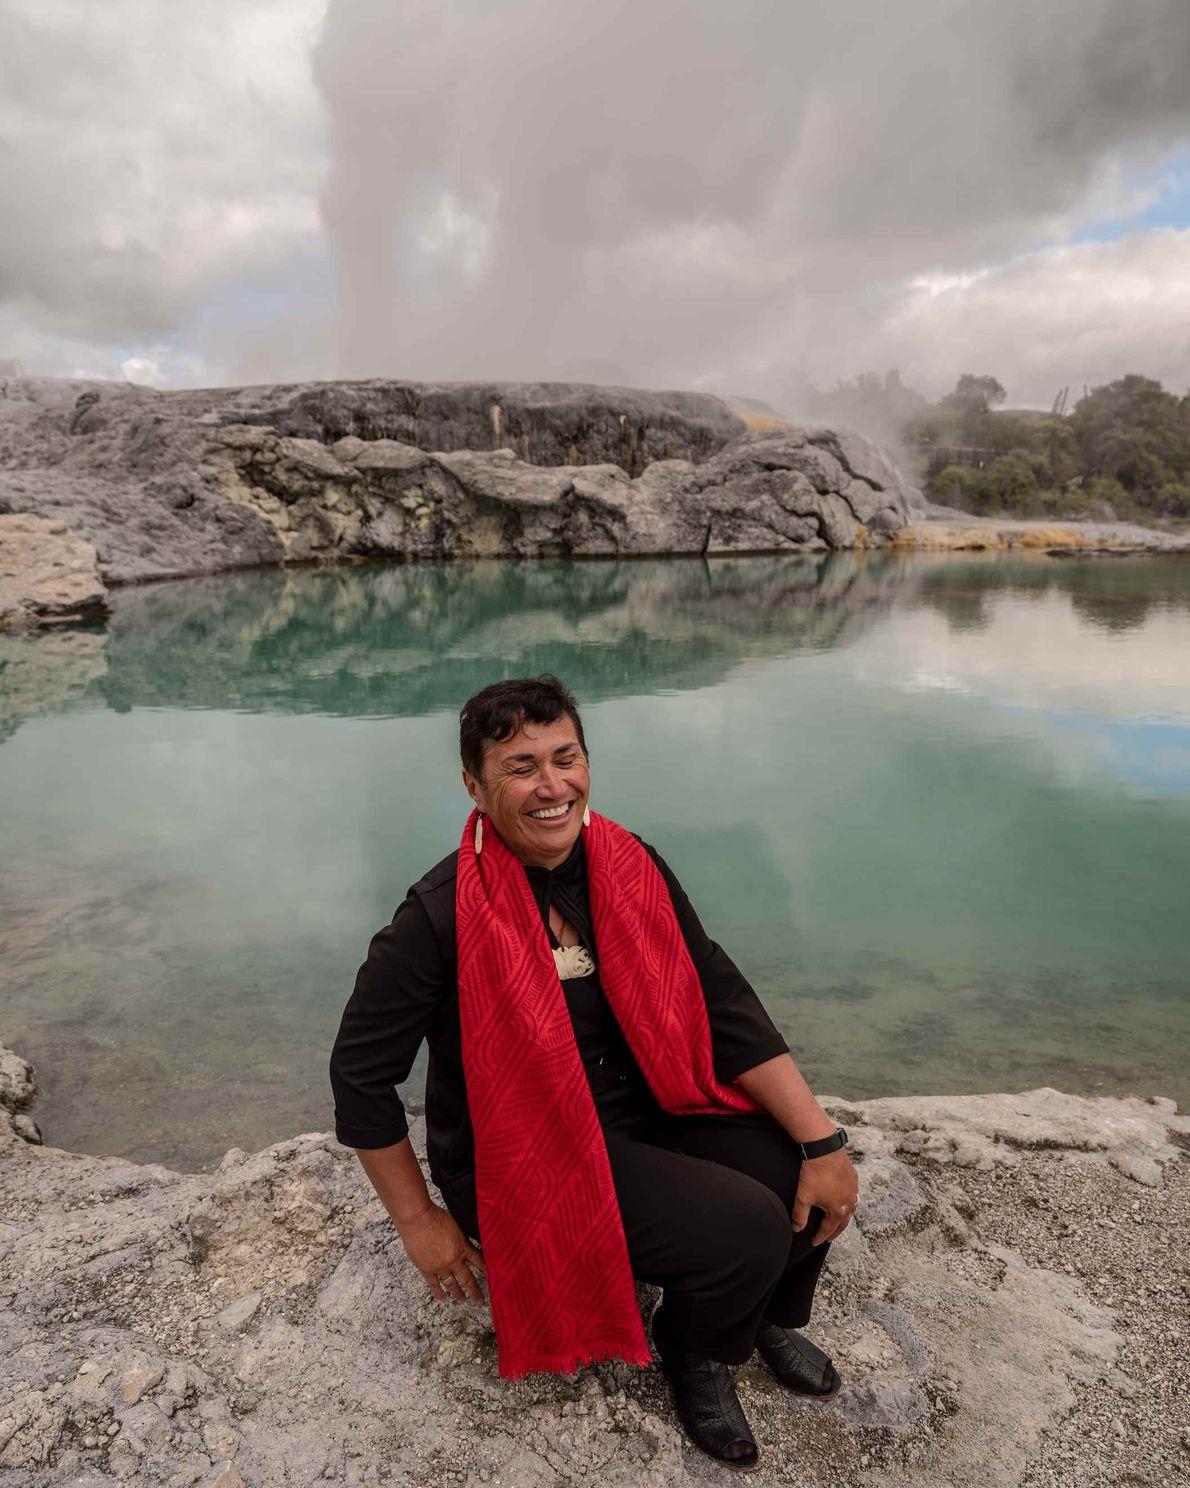 Kirimatao West arbeitet als Guide in Te Puia in Rotorua, wo sie schon seit Jahrzehnten liebend ...